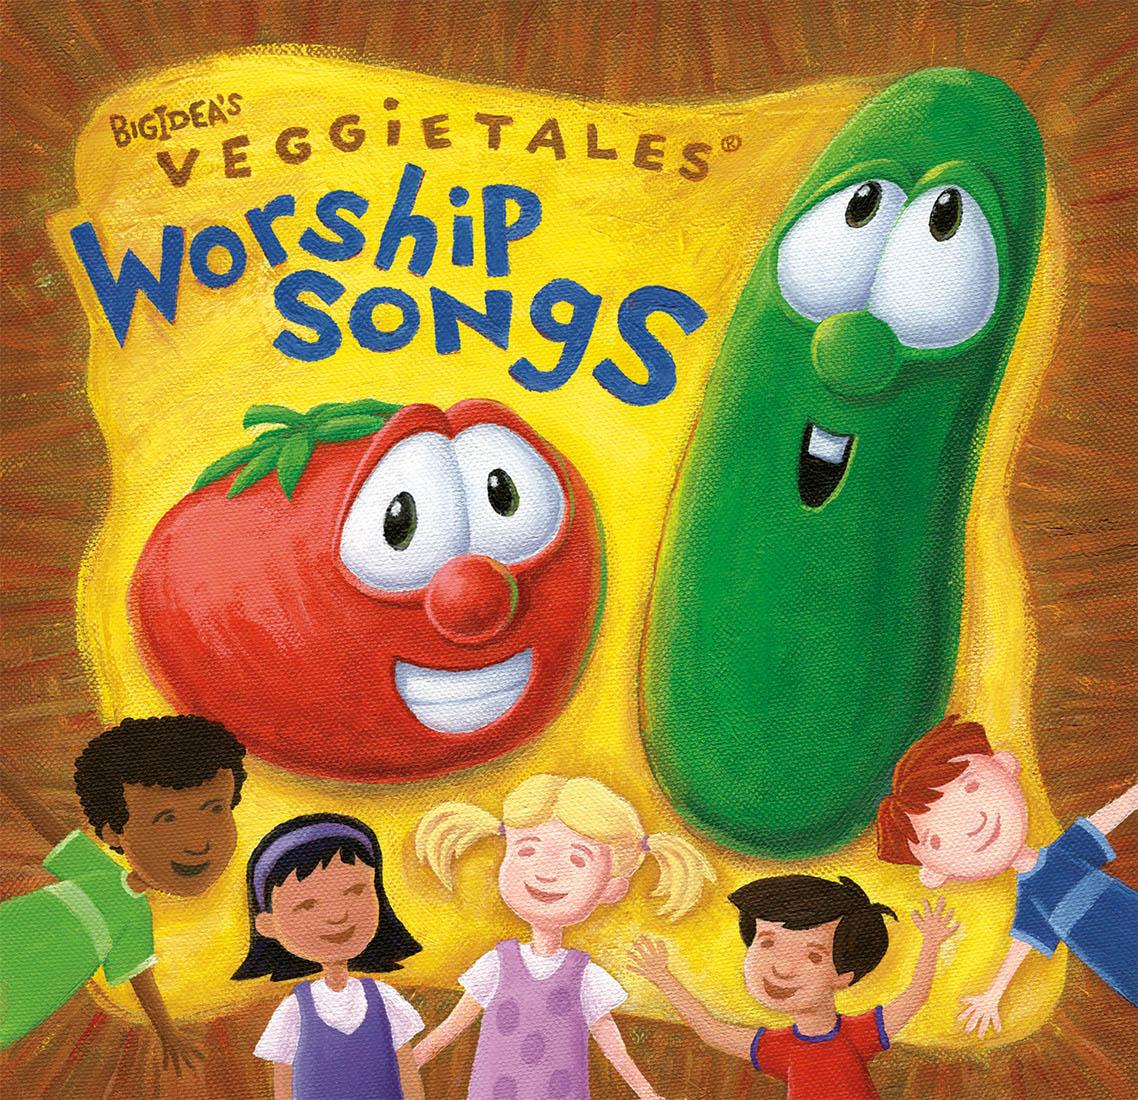 Illustration-CD-Packaging-VeggieTales-Acrylic